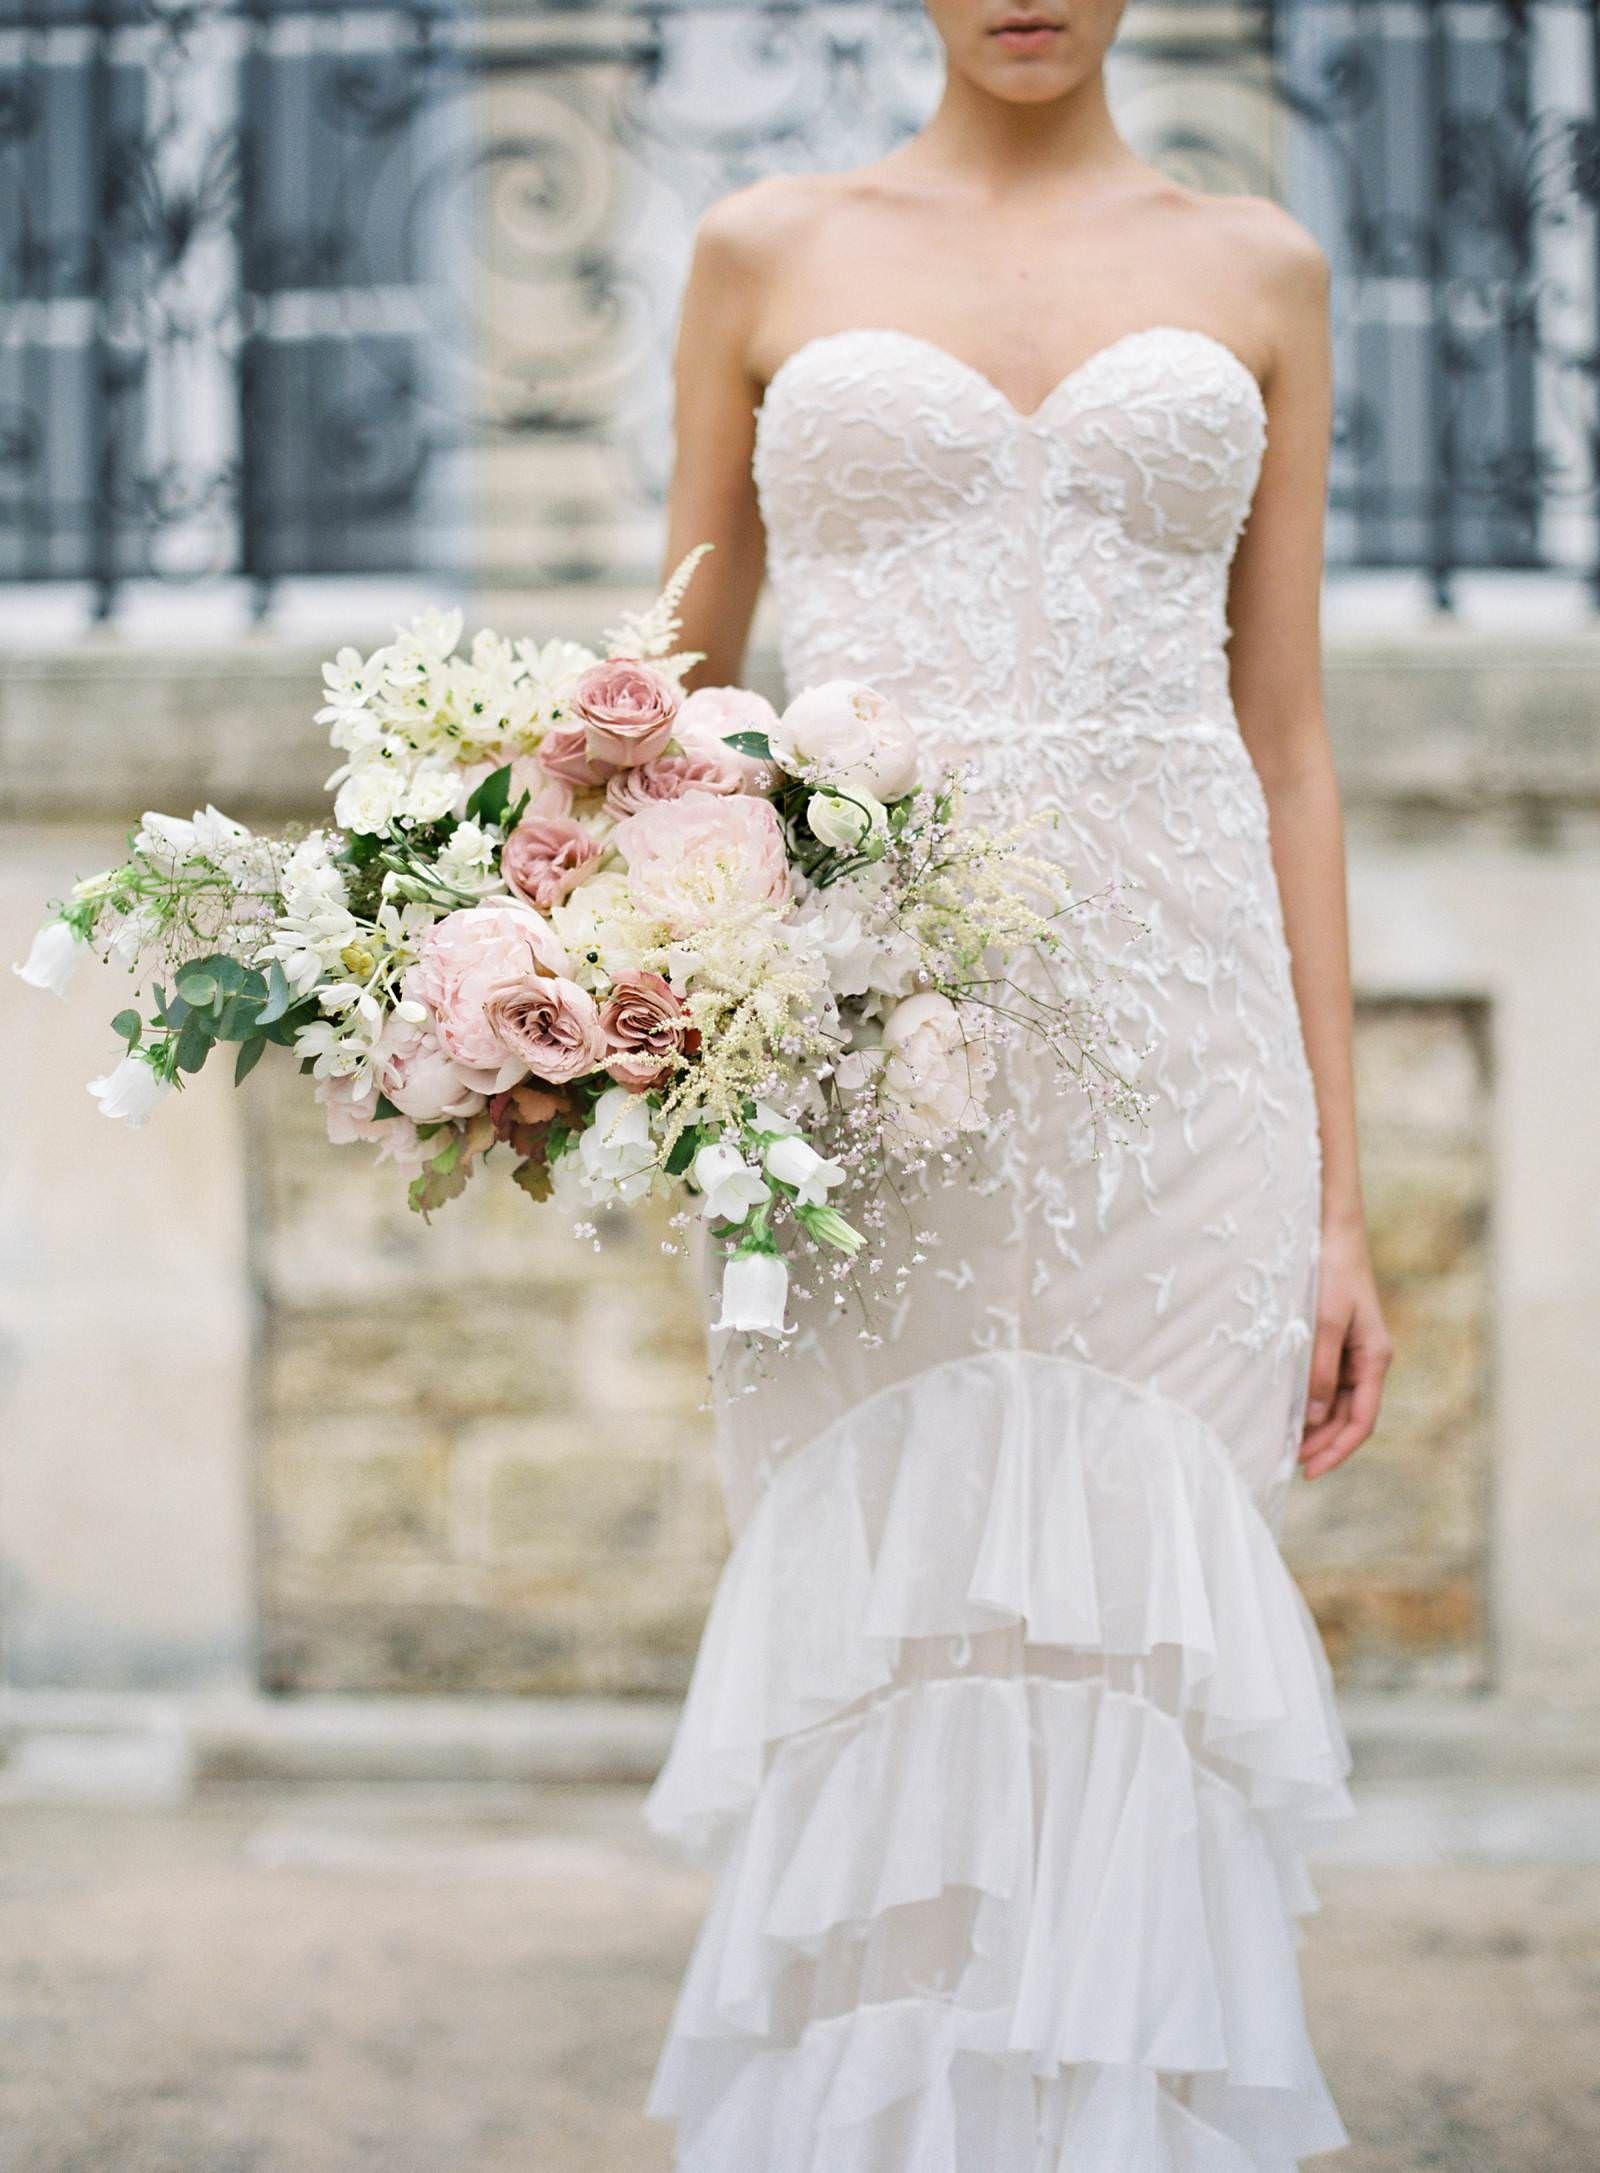 Hemingway Bridal Bouquet Paris Wedding Florist Lush Blush Bridal